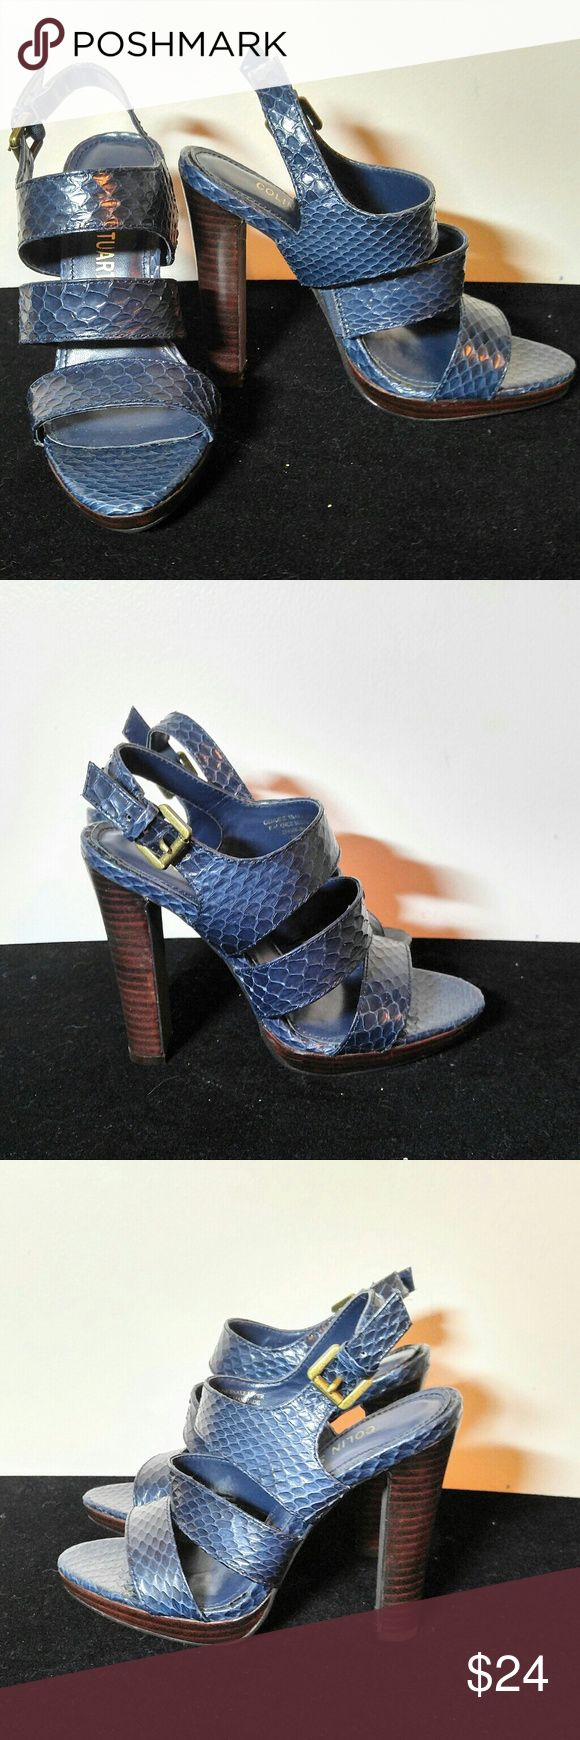 Sale!!! Victoria Secret Colin Stuart Heels Sz 6 M Victoria Secret Colin Stuart Heels Sz 6 M - These heels are in EXCELLENT condition, color is a dark blue. Heel is 5 inches Colin Stuart Shoes Heels